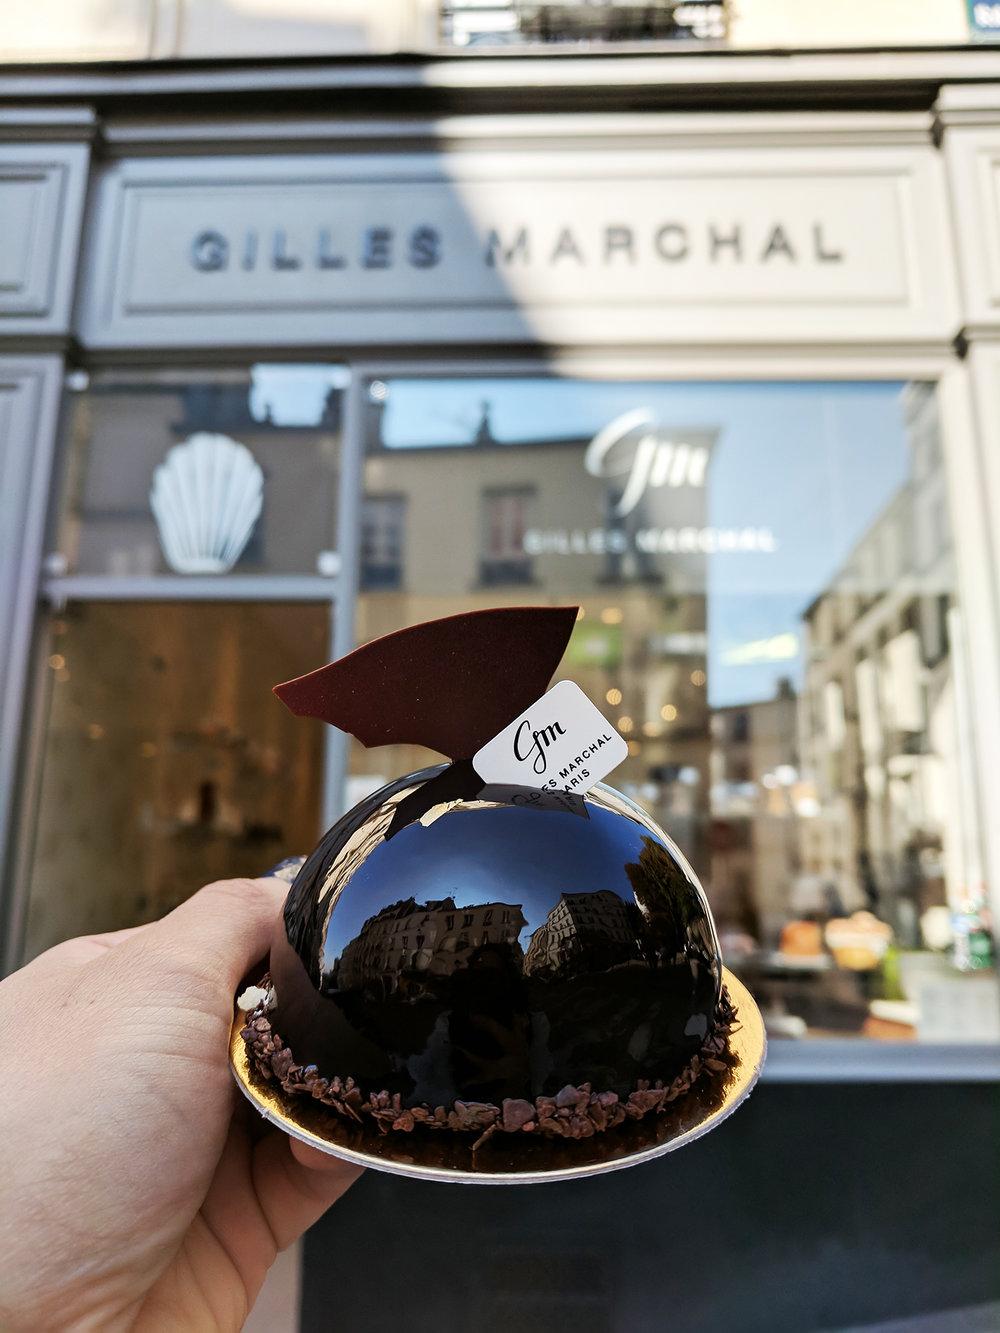 dôme-chocolat-gilles-marchal.jpg